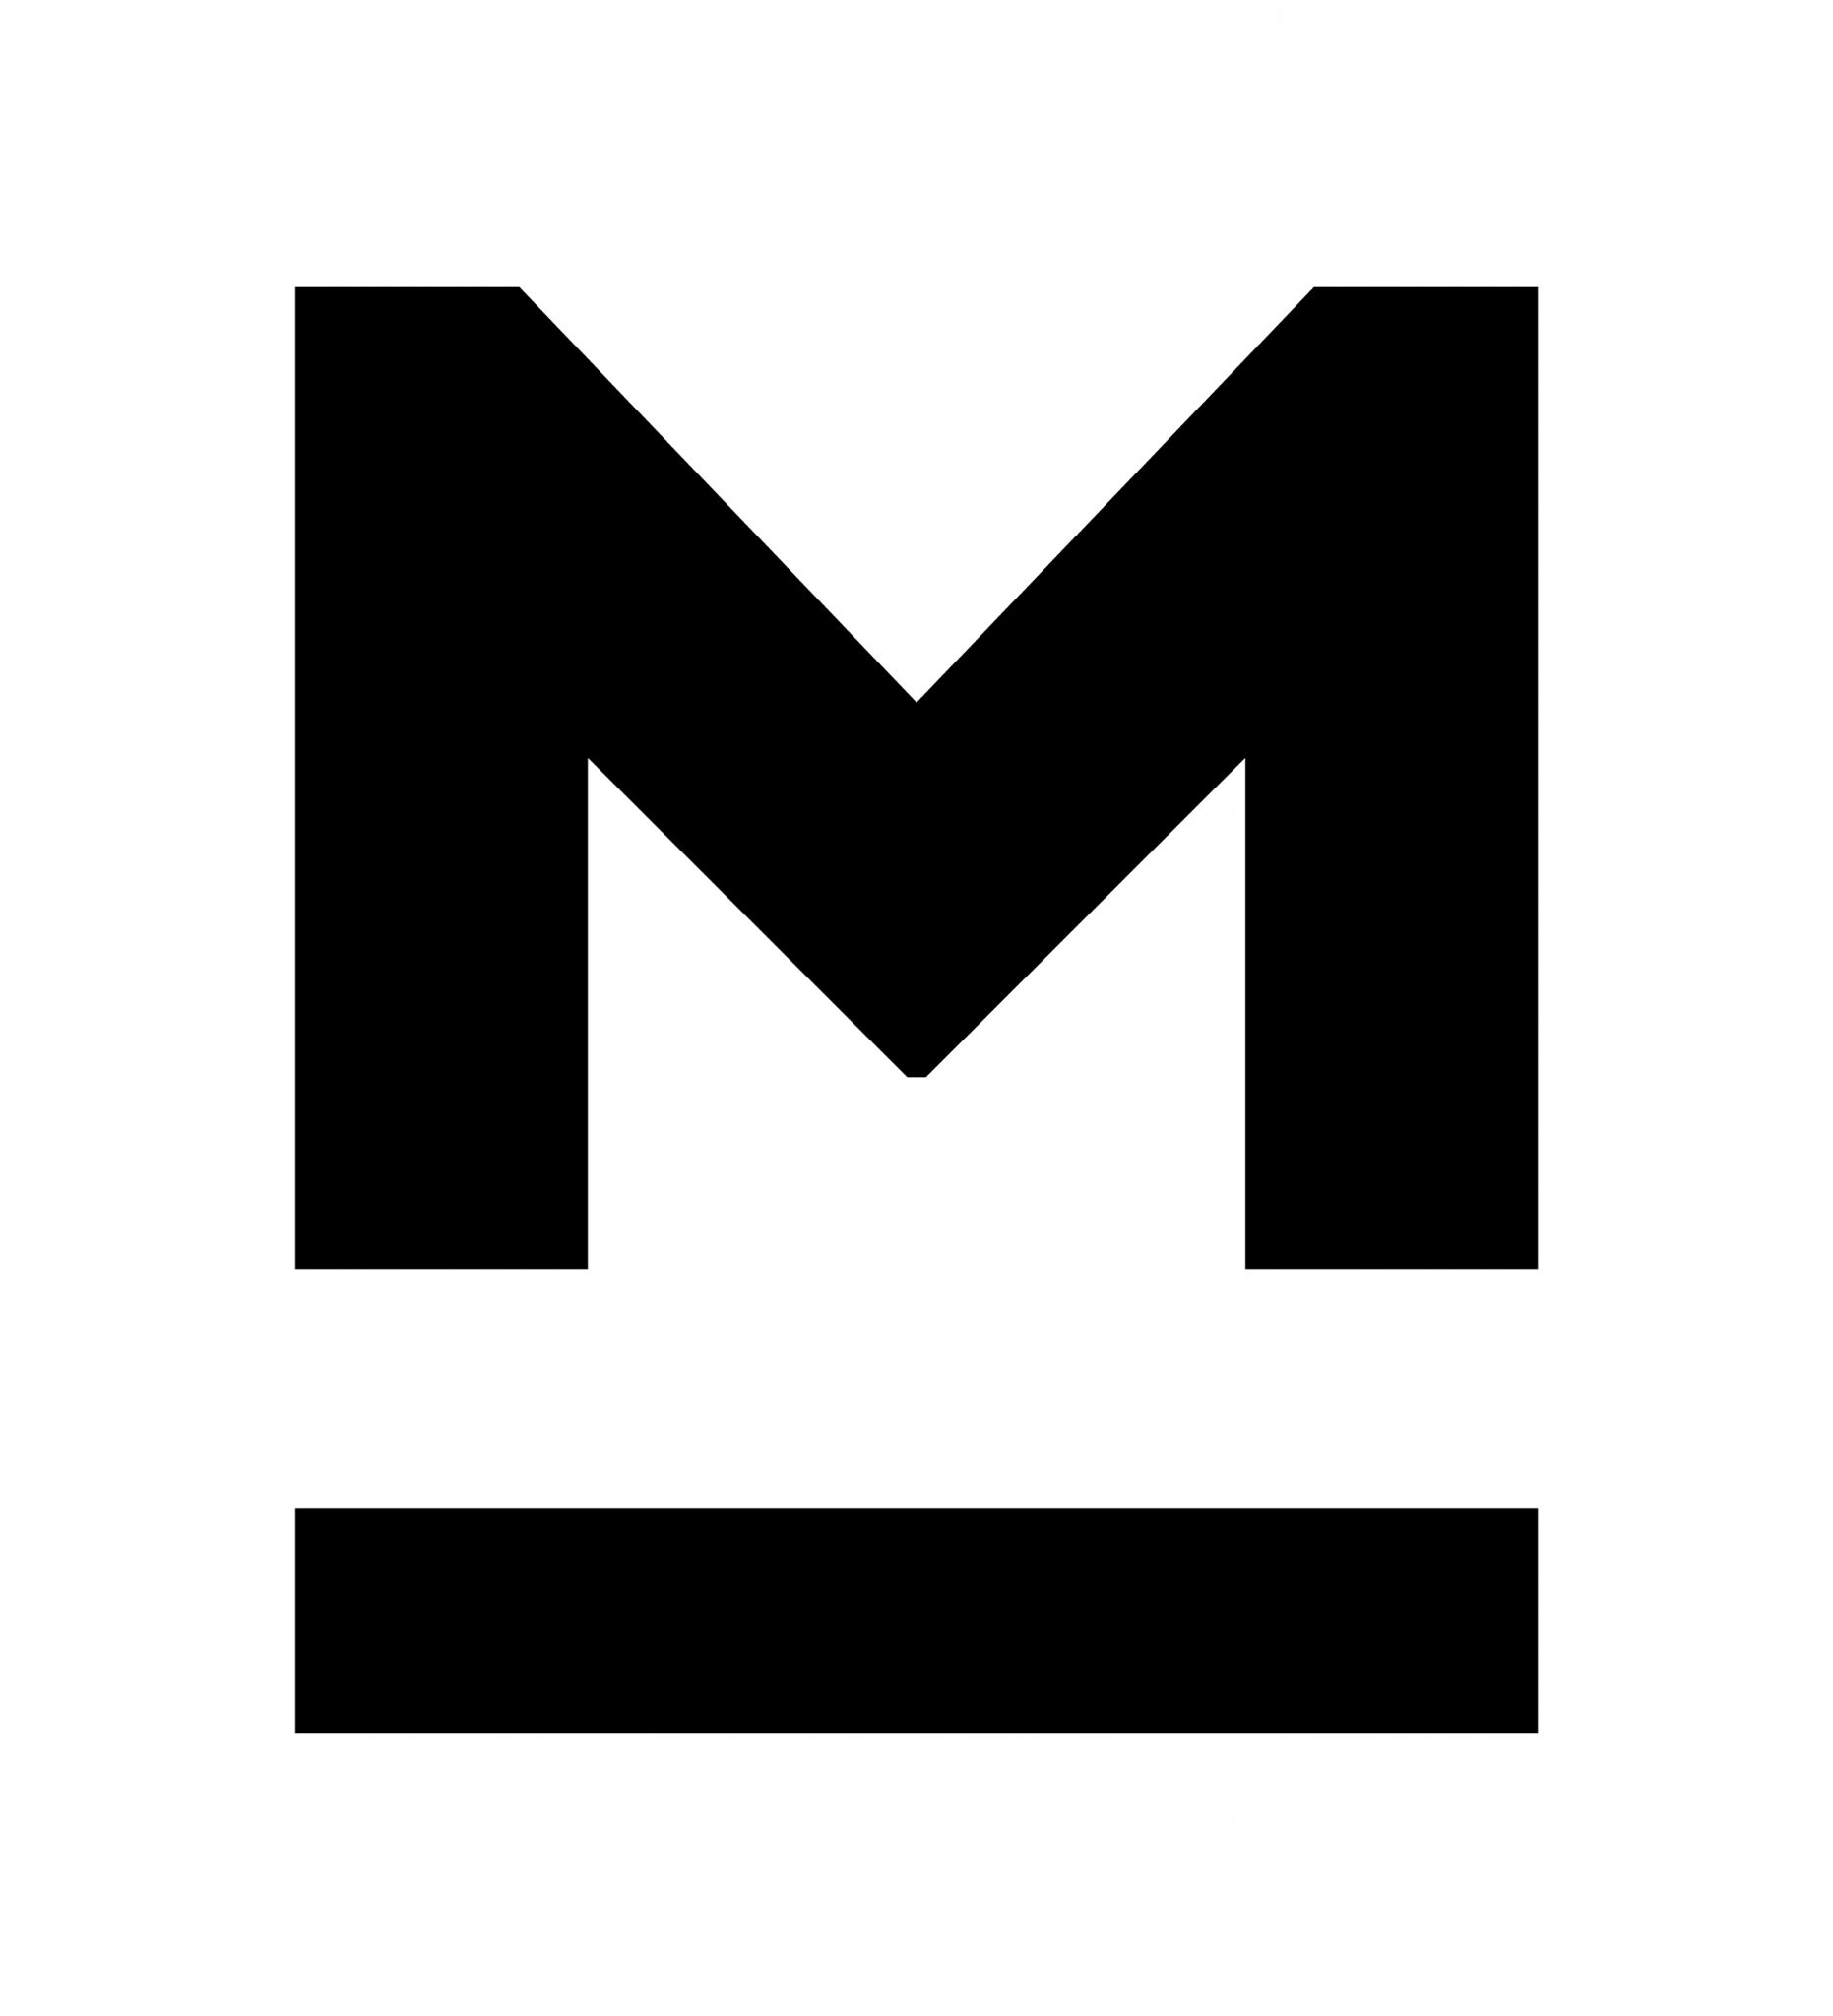 MEFA_LOGO_MOBILE